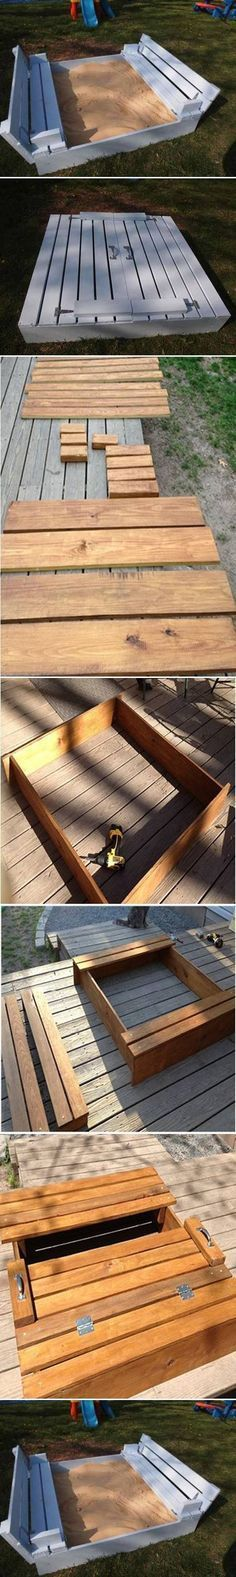 DIY Sandbox for Kids | http://iCreativeIdeas.com Like Us on Facebook ==> https://www.facebook.com/icreativeideas http://www.amandafarwick.com